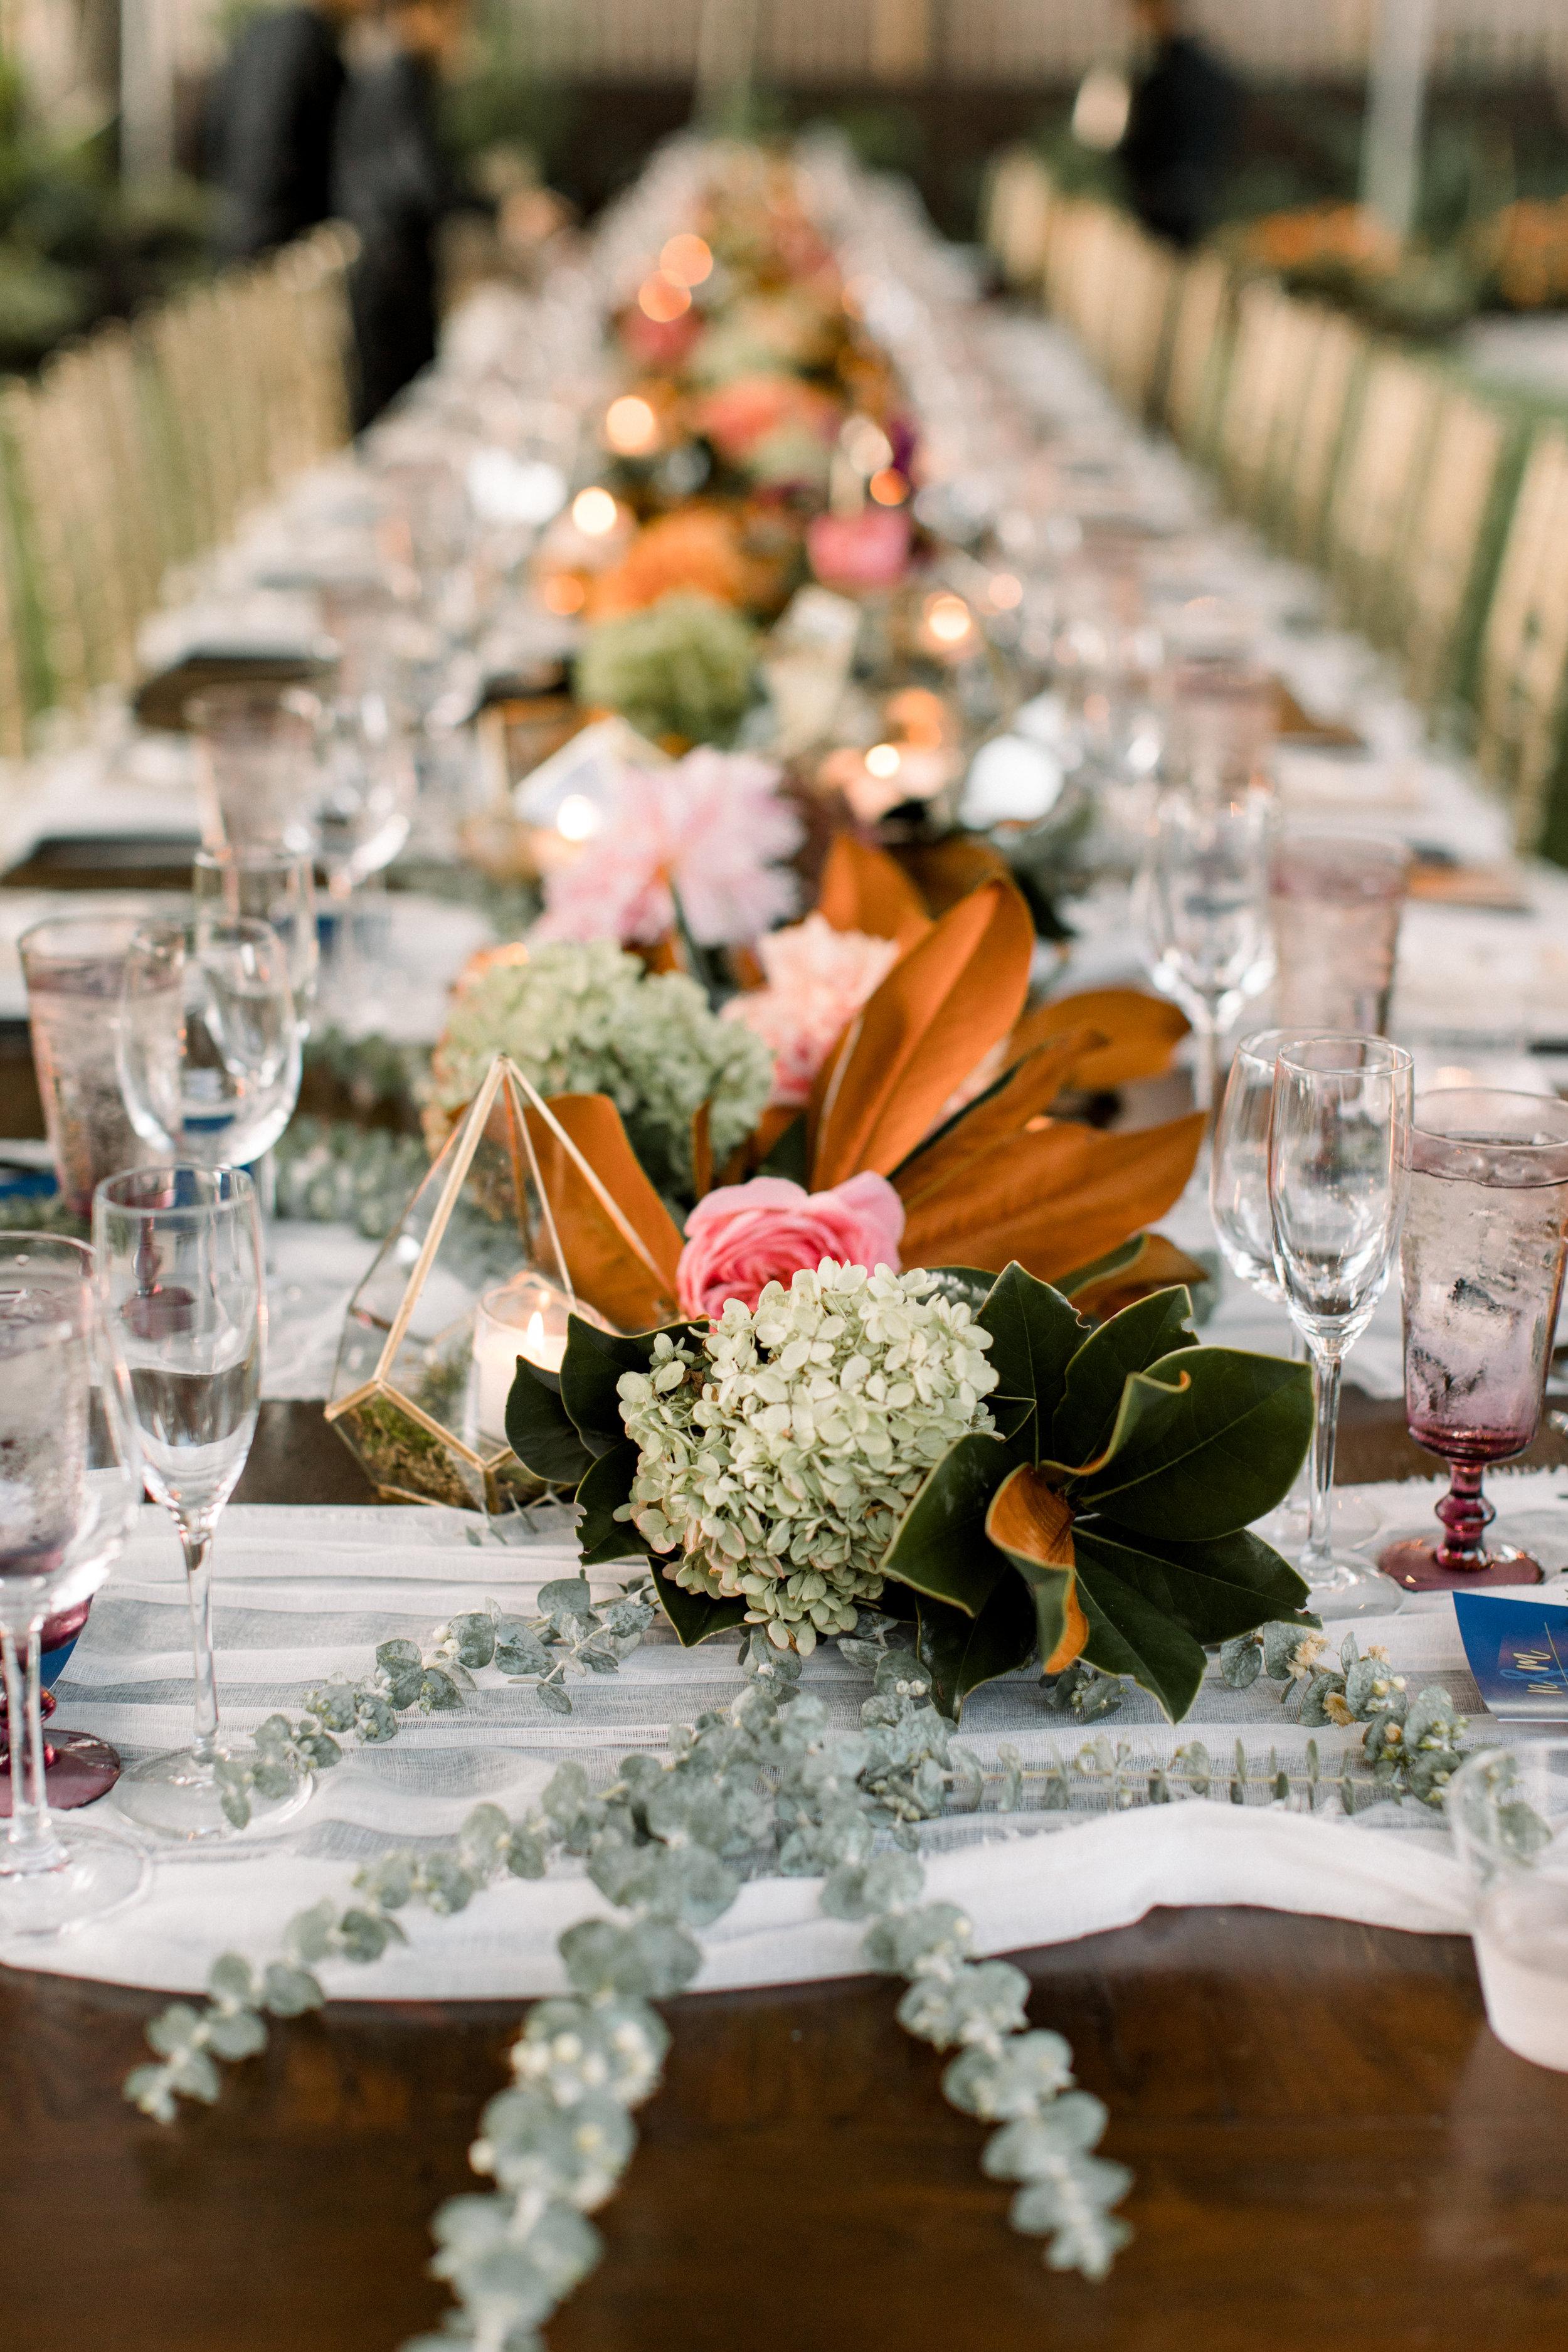 NJ Wedding, Backyard Wedding, Garland, Rectangle Table, Centerpiece, Magnolia Garland, Samantha Jay Photography